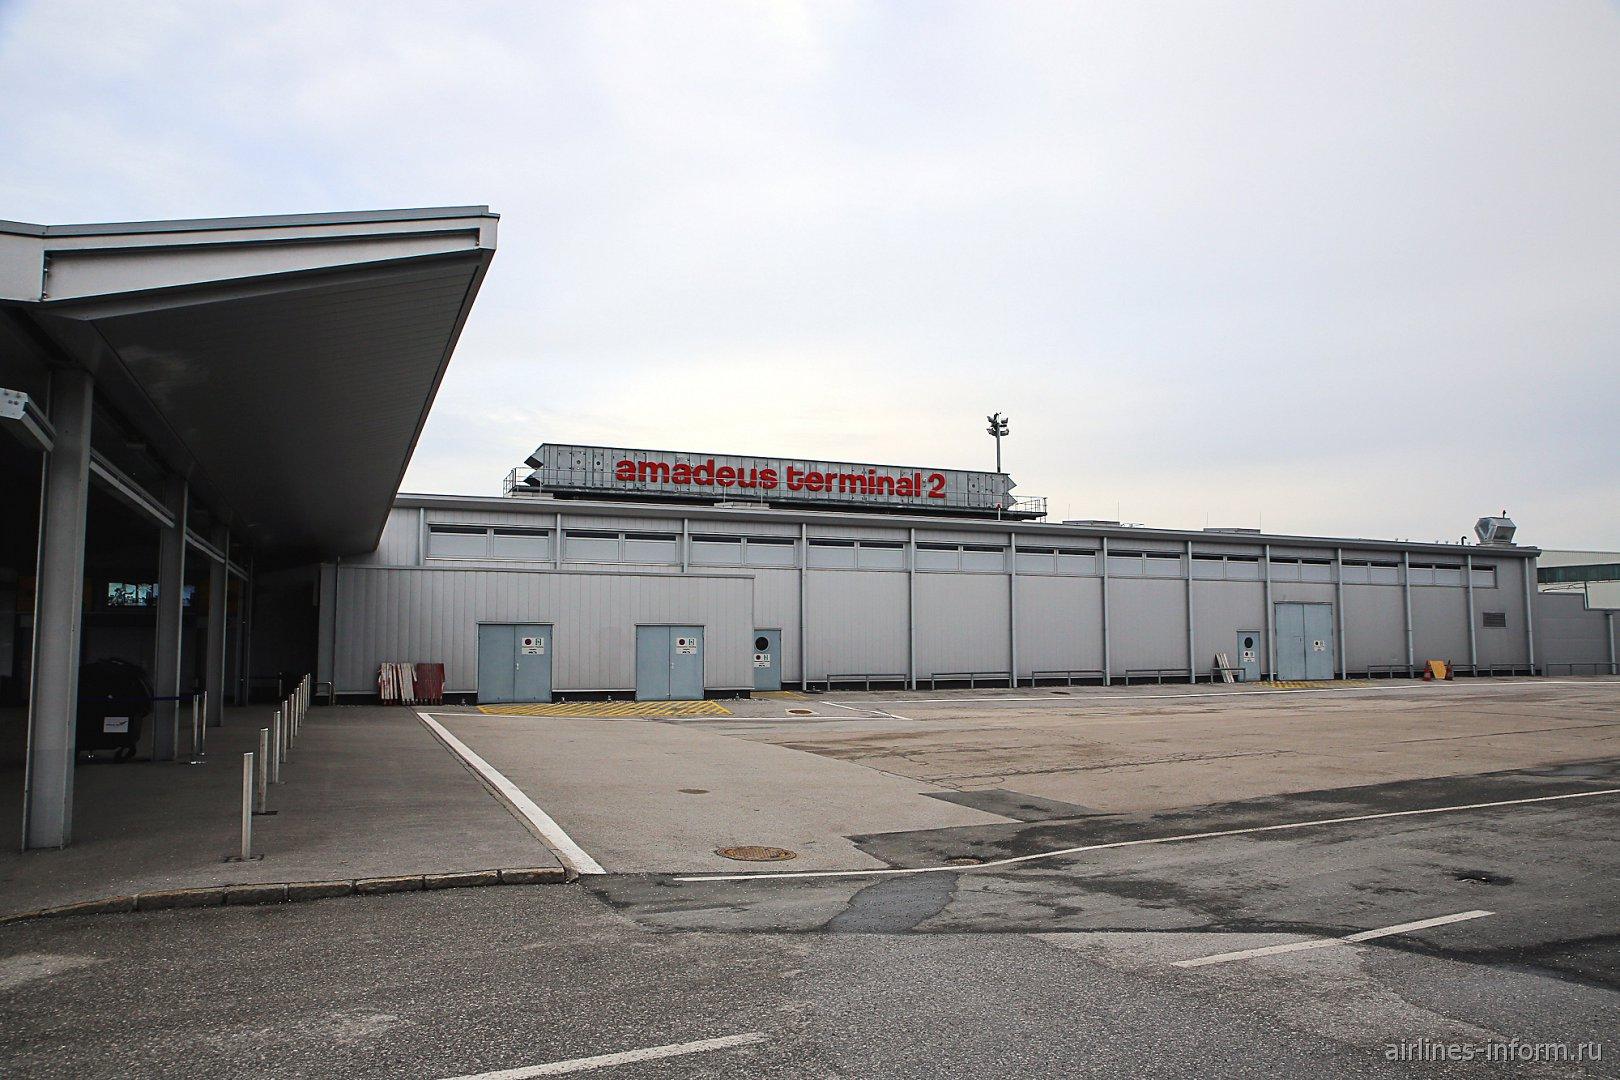 Пассажирский терминал 2 в аэропорту Зальцбург